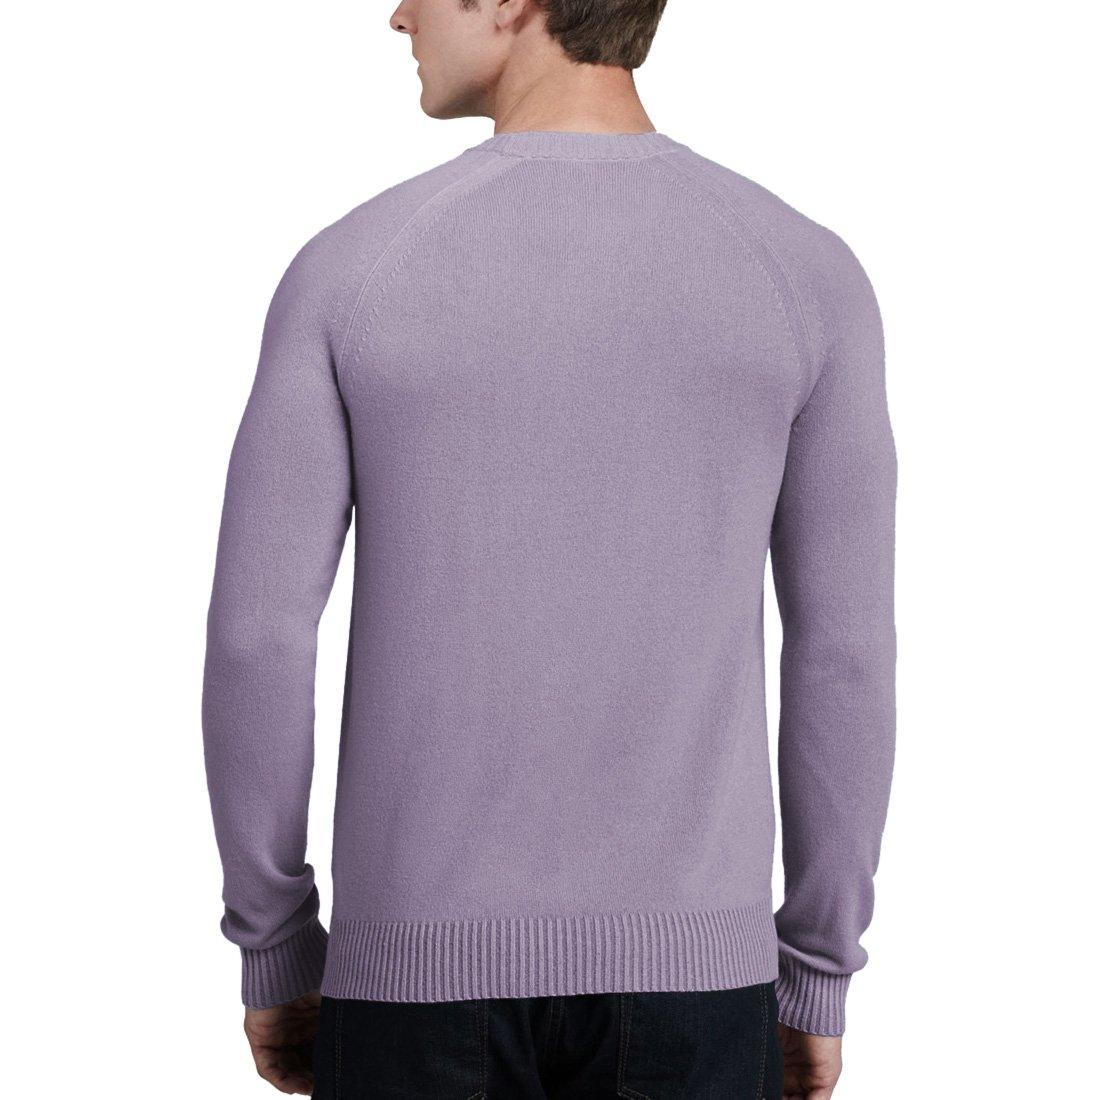 Parisbonbon Mens 100/% Cashmere Raglan Sleeve Sweater